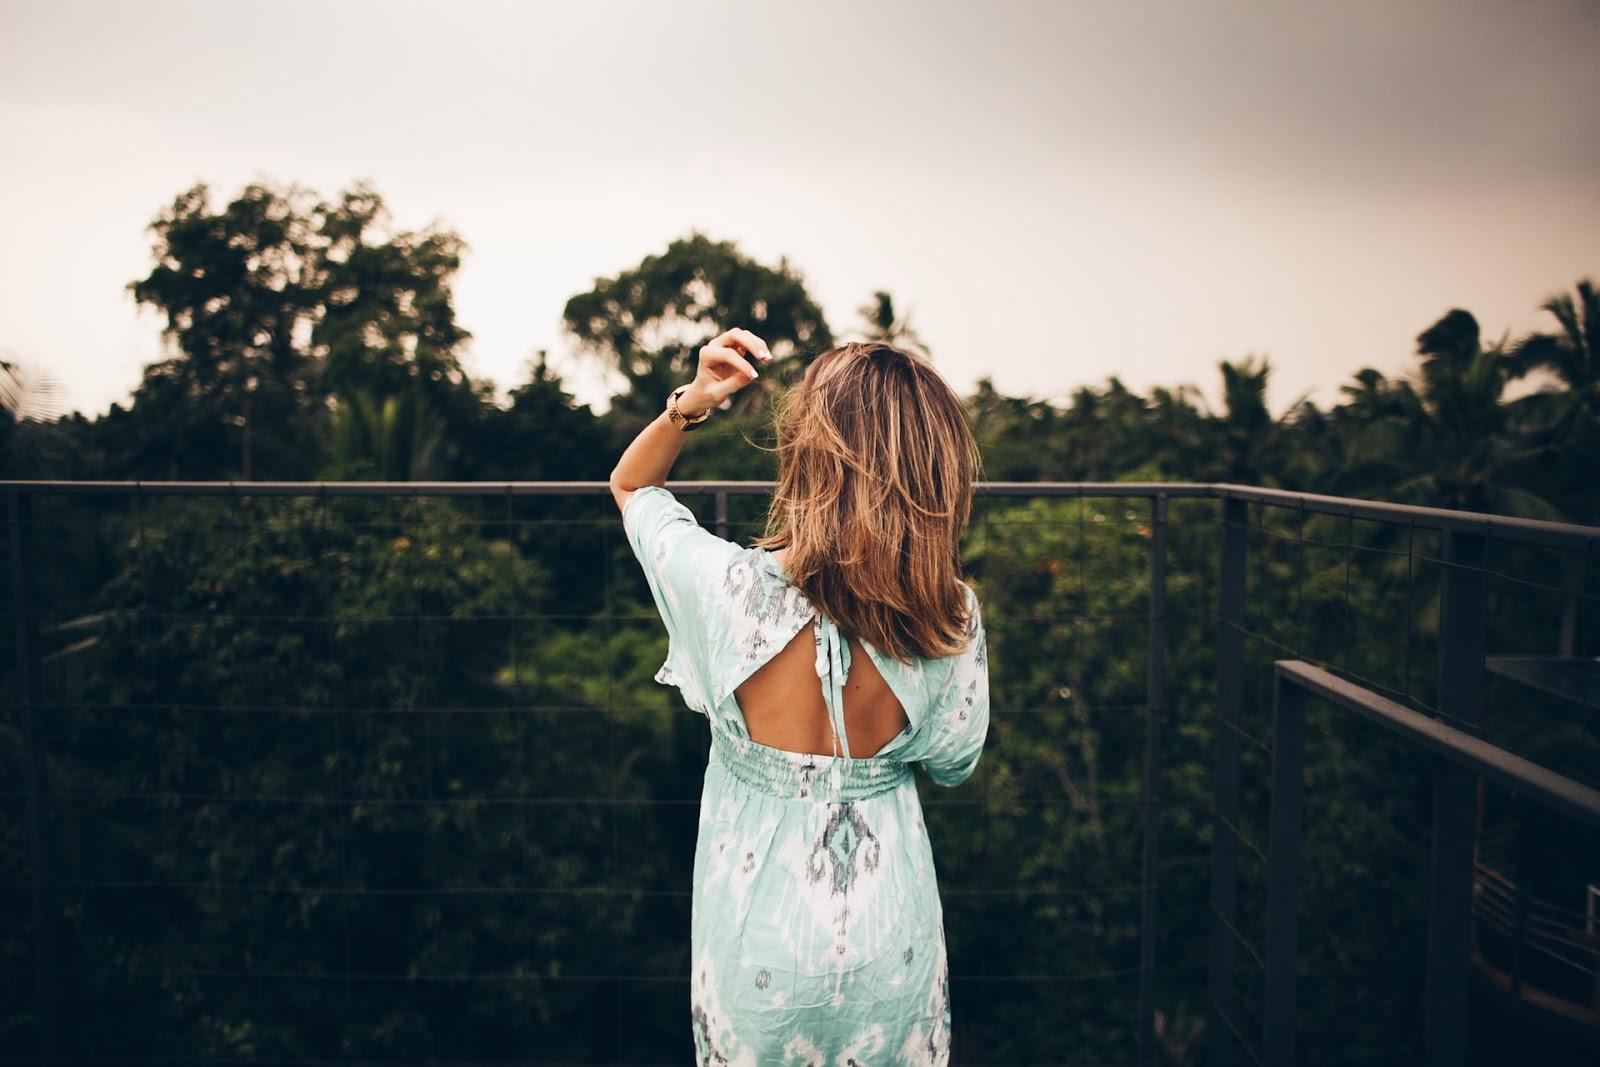 A woman on a balcony.